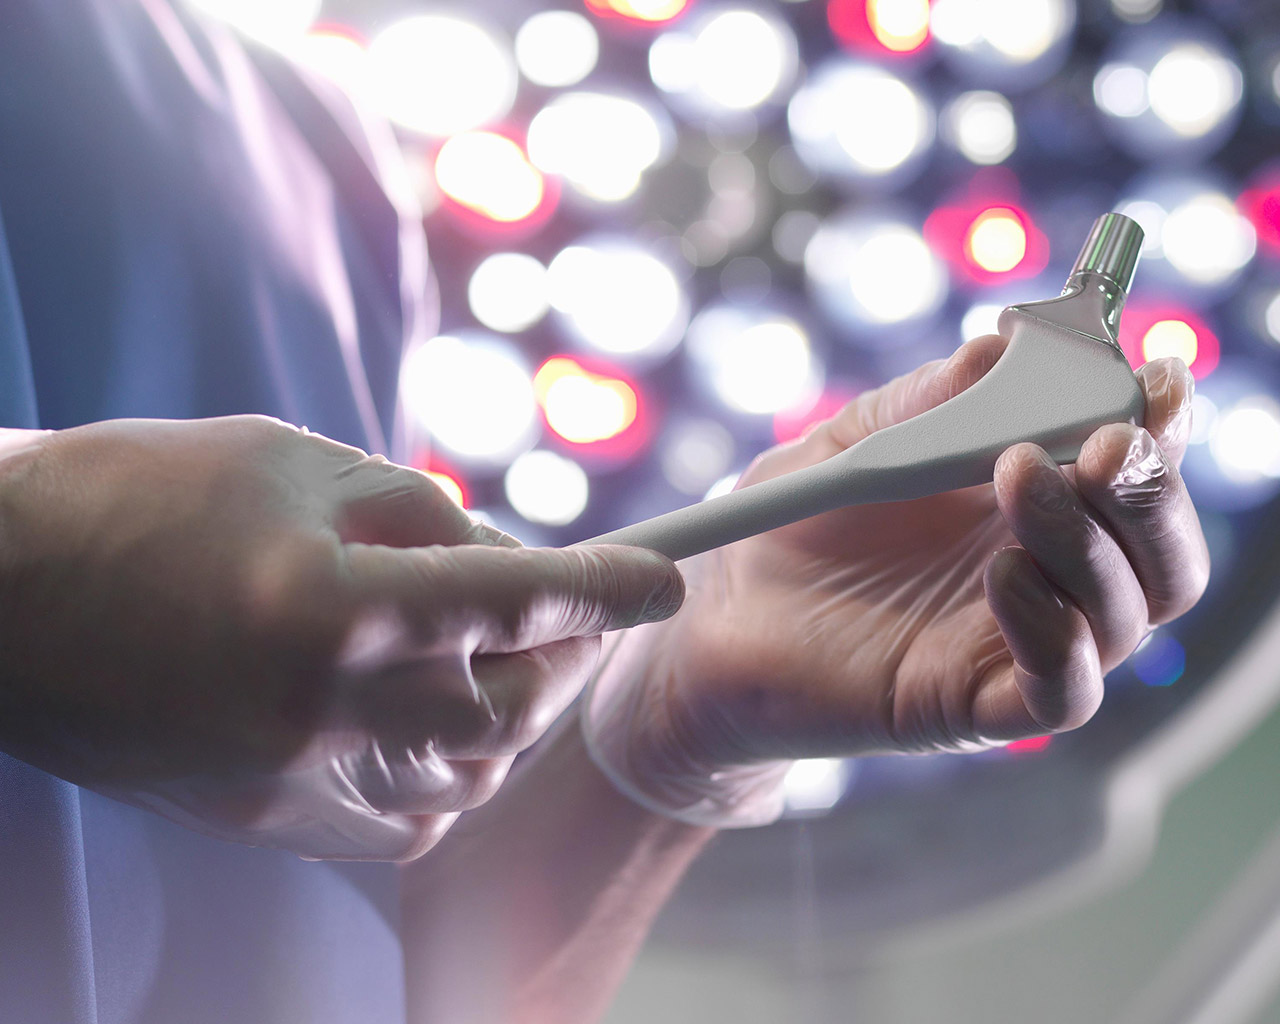 Biokompatible PolyJet 3D Druck Materialien.